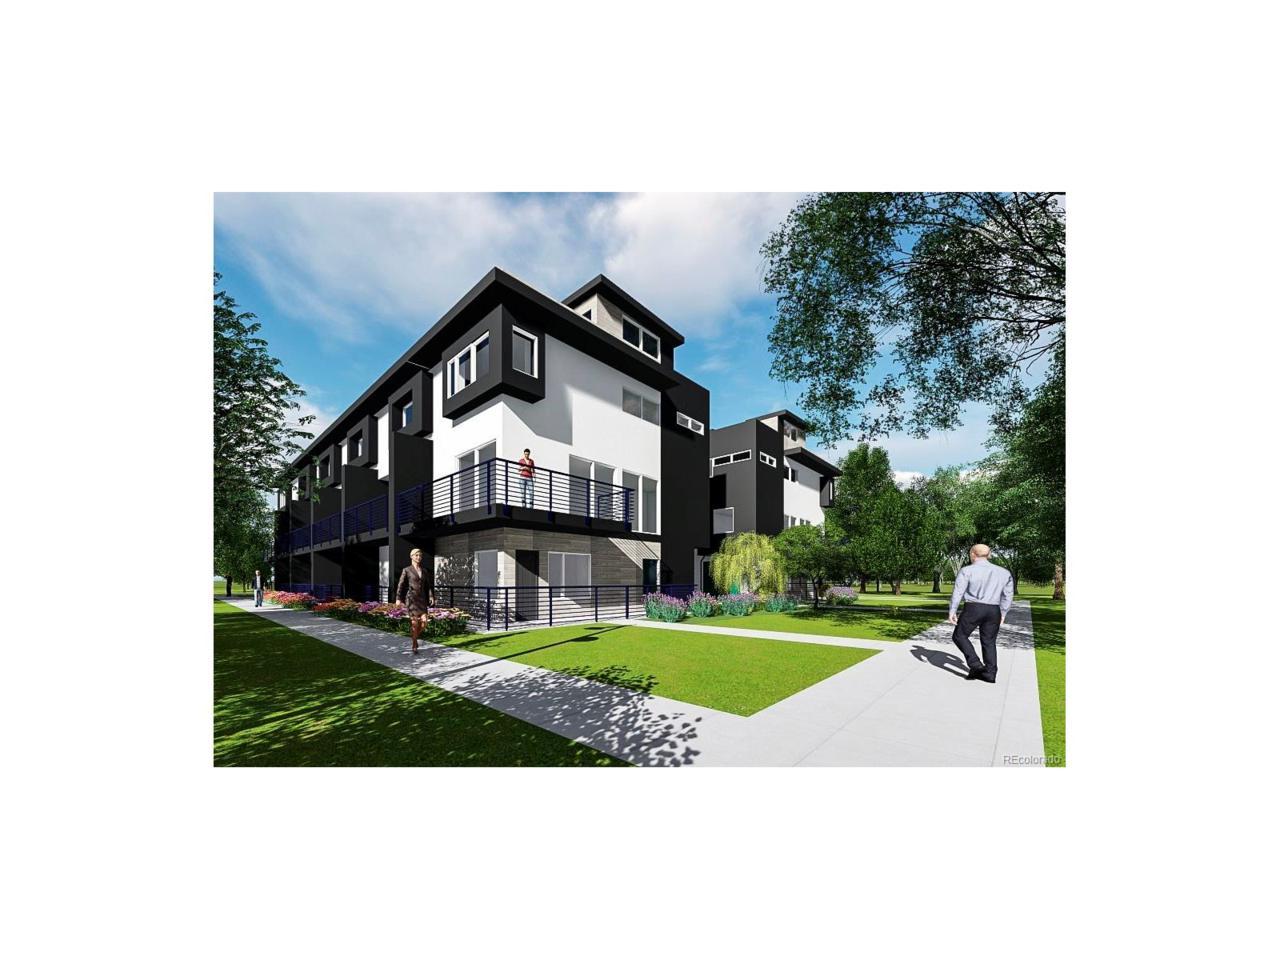 1553 N King Street, Denver, CO 80204 (MLS #8336582) :: 8z Real Estate